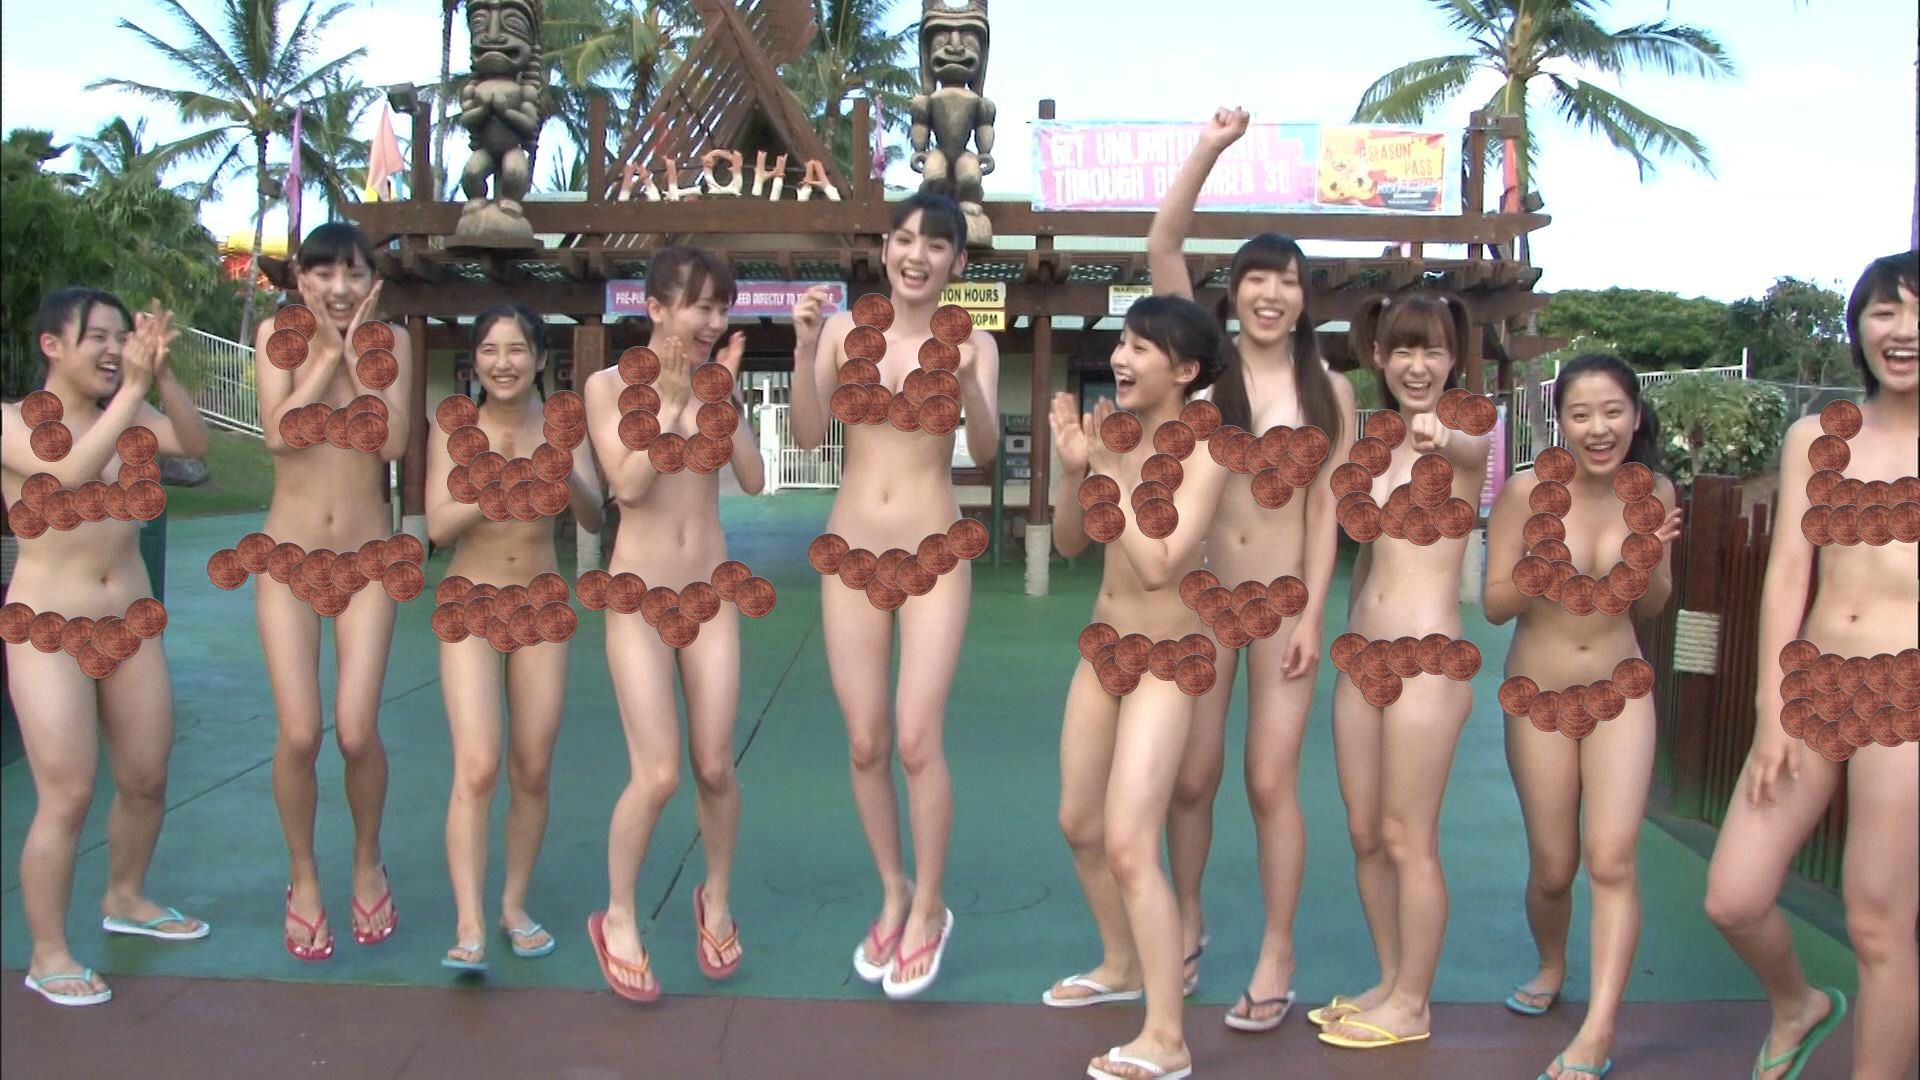 http://livedoor.blogimg.jp/darkm/imgs/9/4/949b9729.jpg